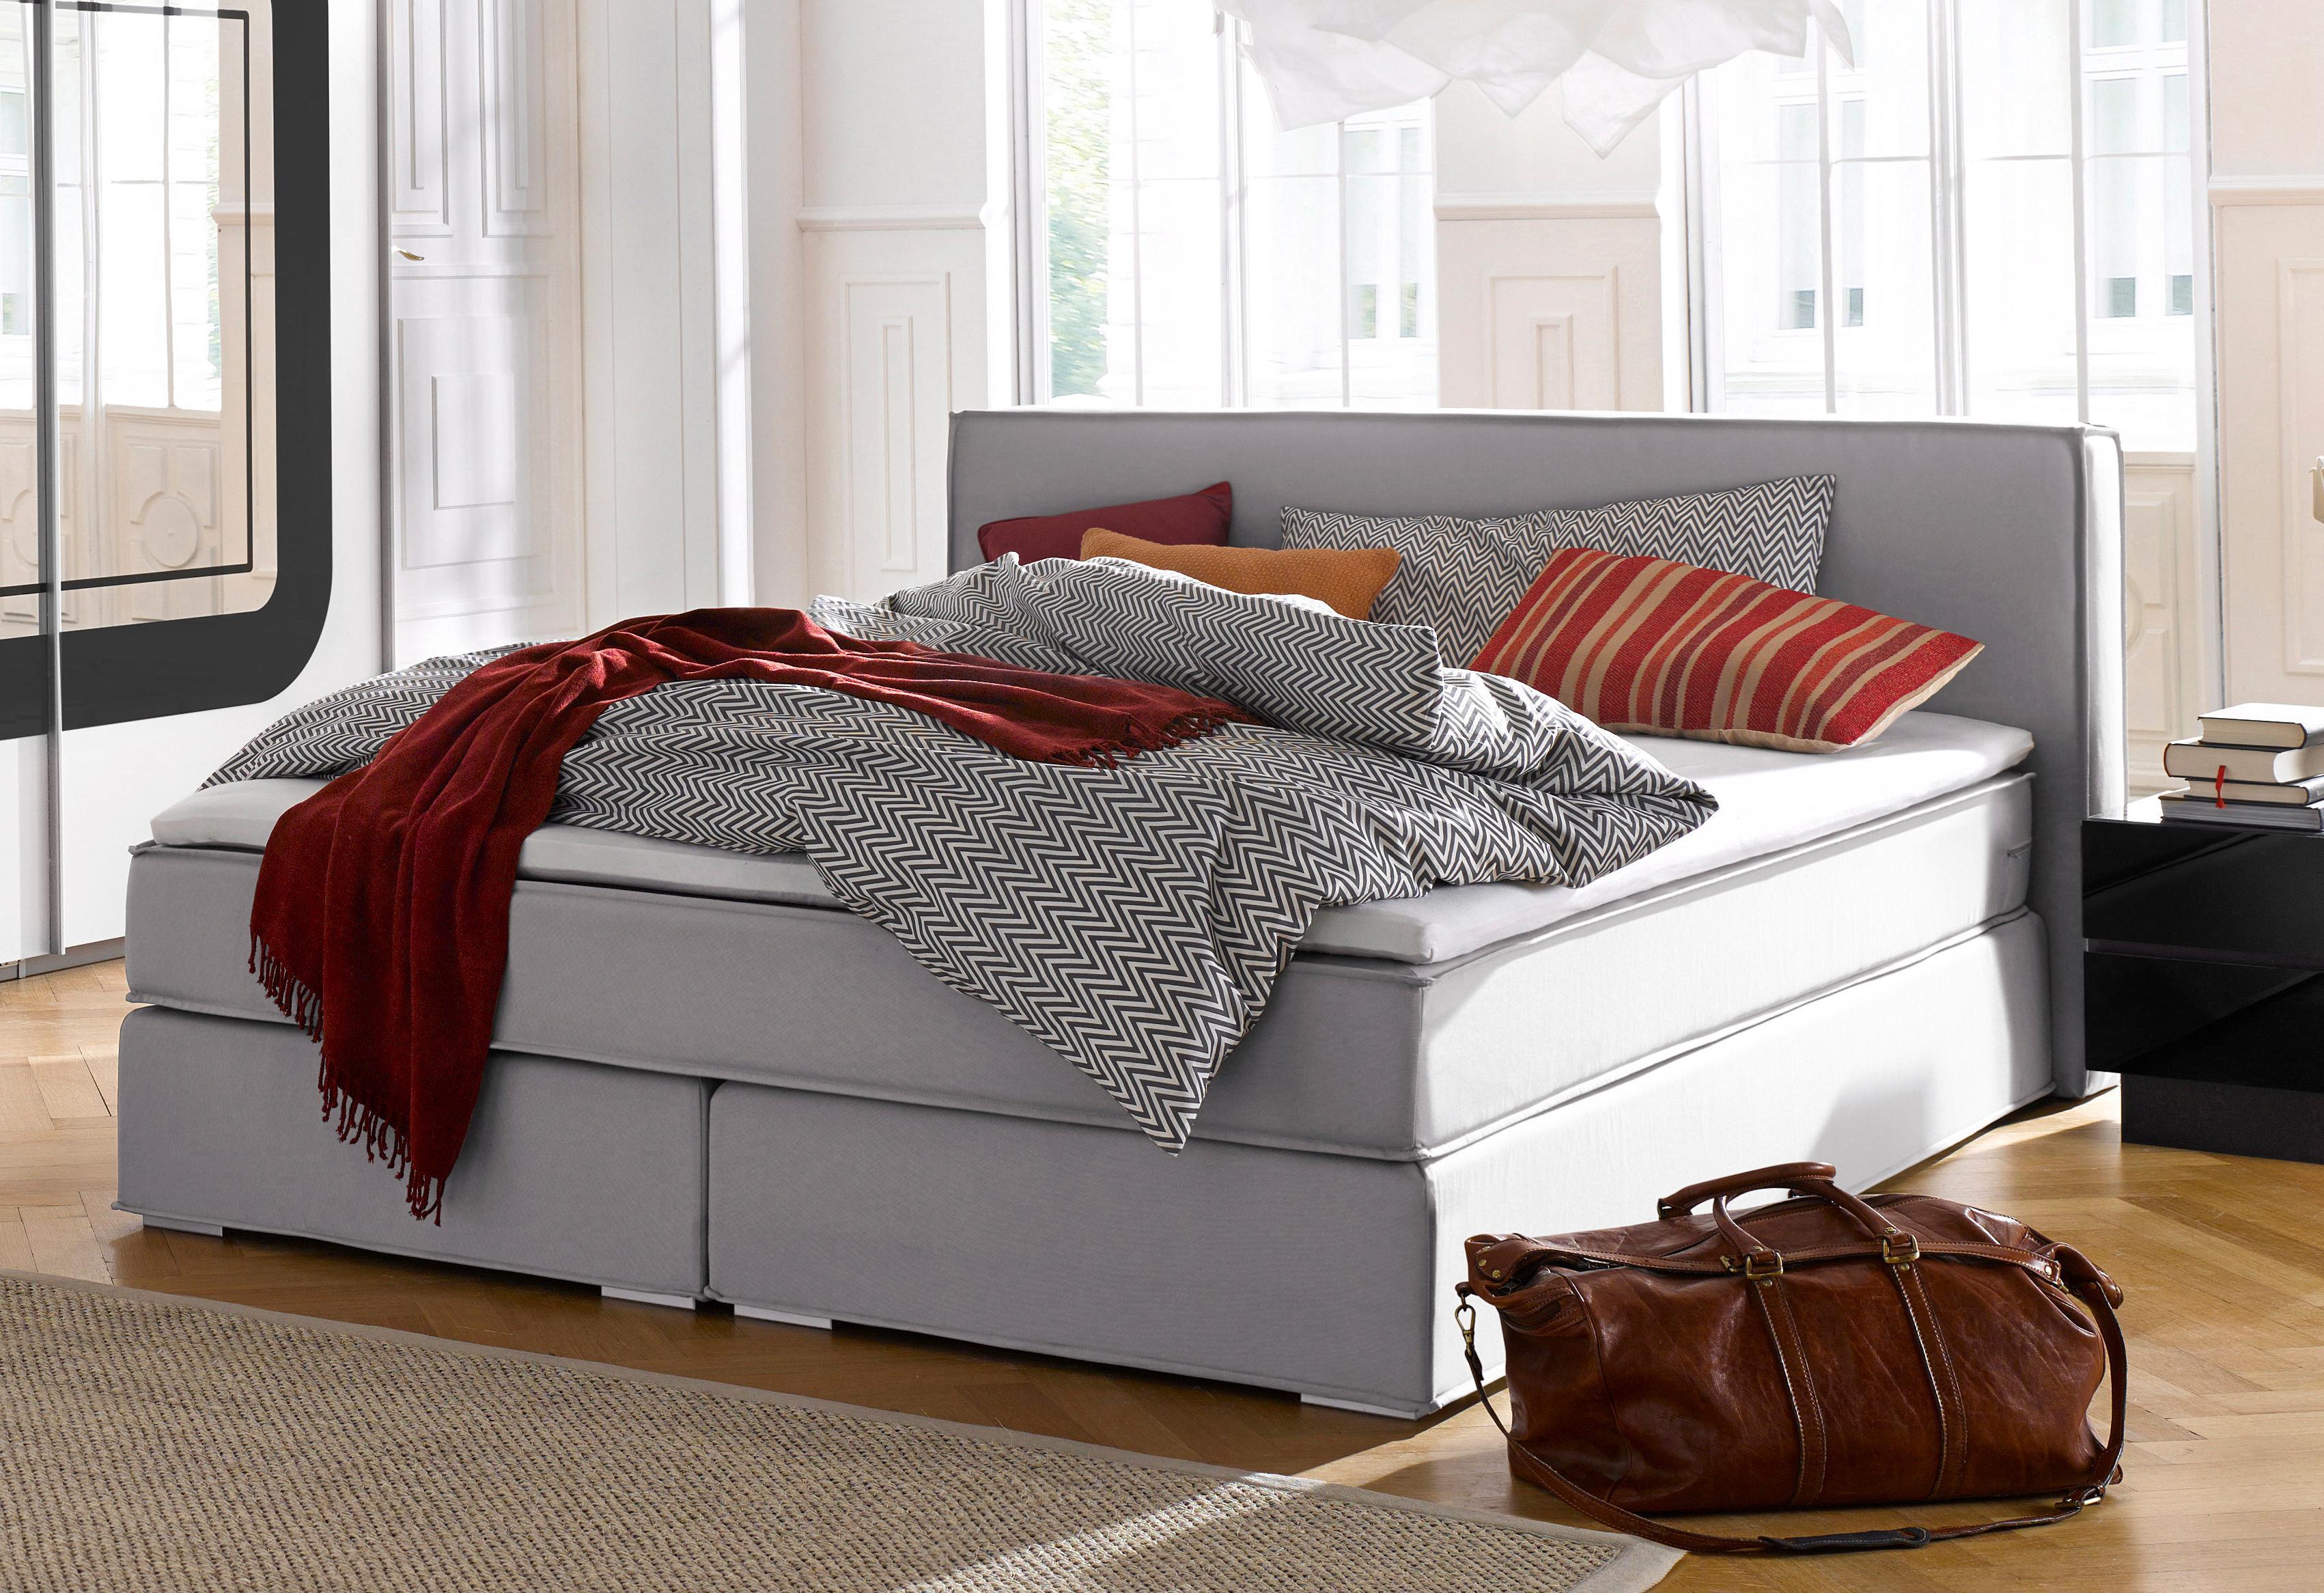 Atlantic Home Collection Boxspringbett   Schlafzimmer > Betten > Boxspringbetten   Holz - Strukturstoff - Polyester - Federn   ATLANTIC HOME COLLECTION